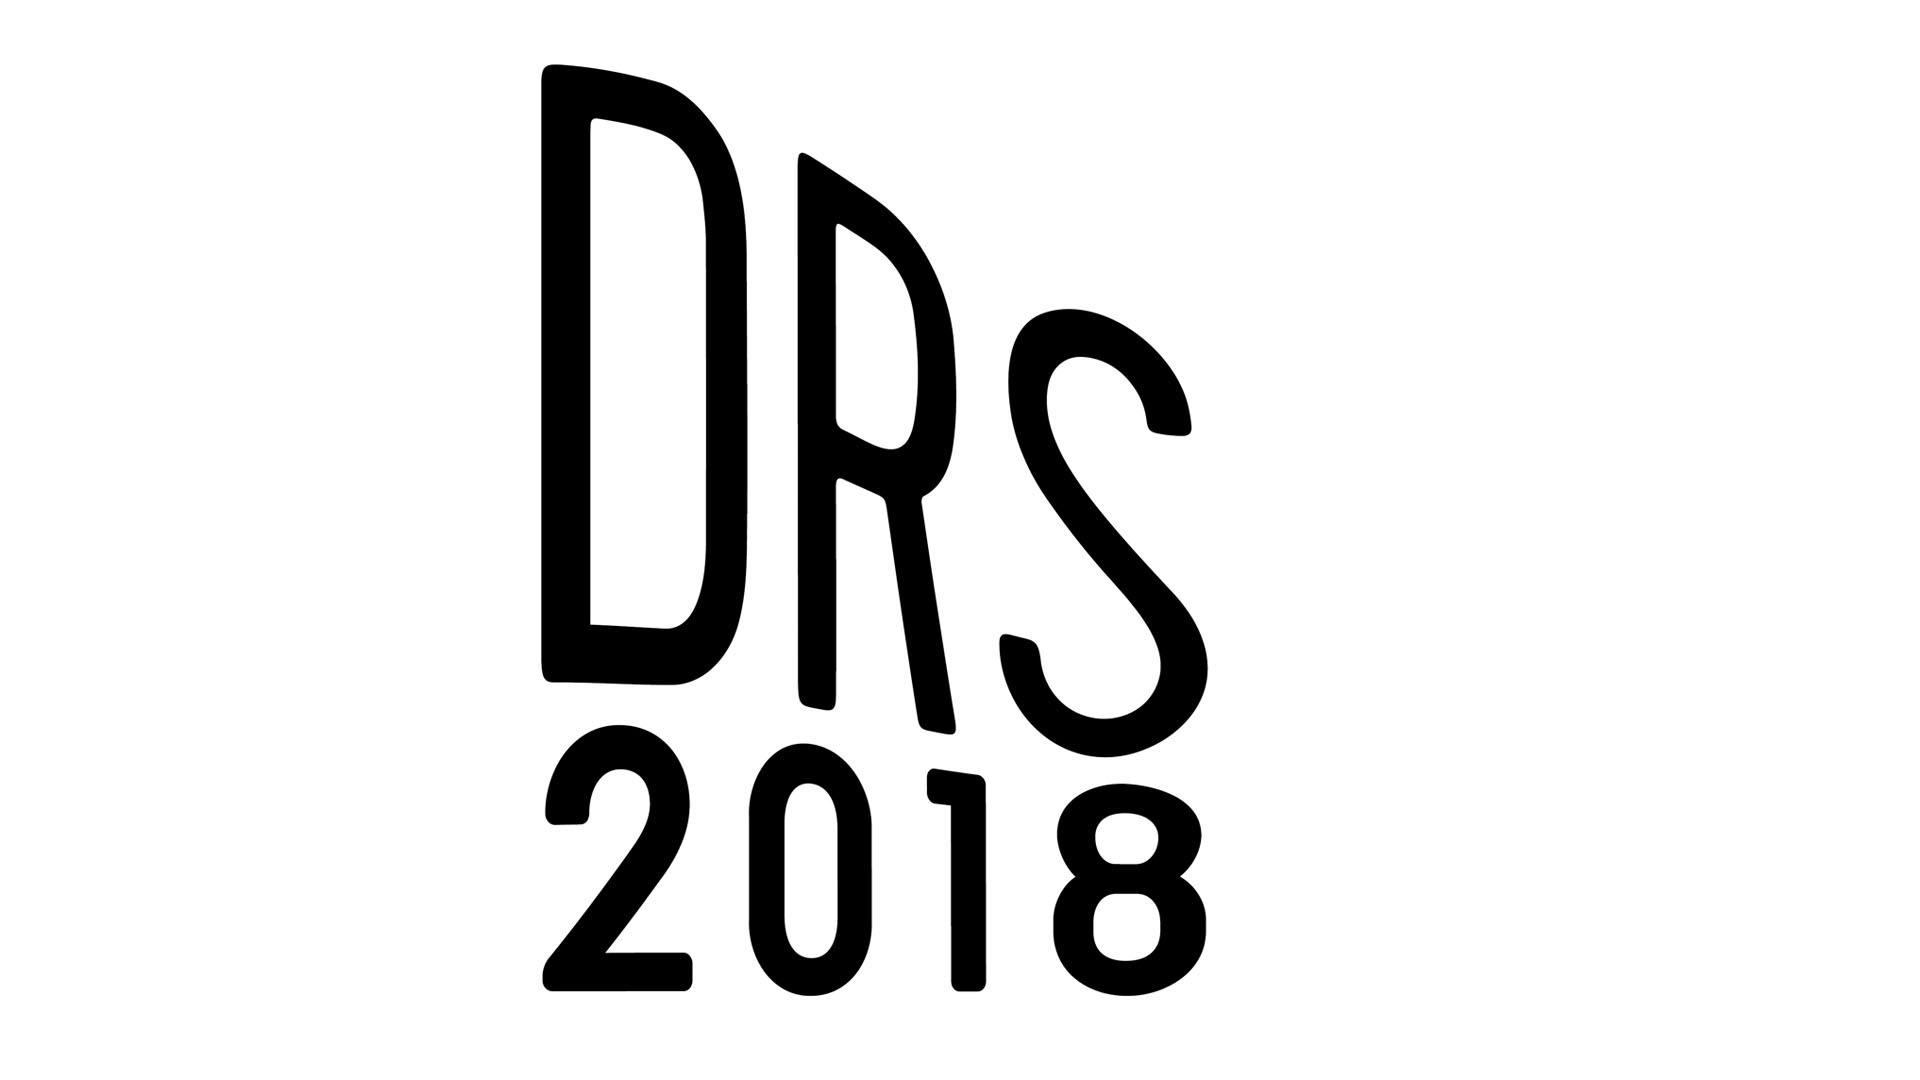 DRS18 1